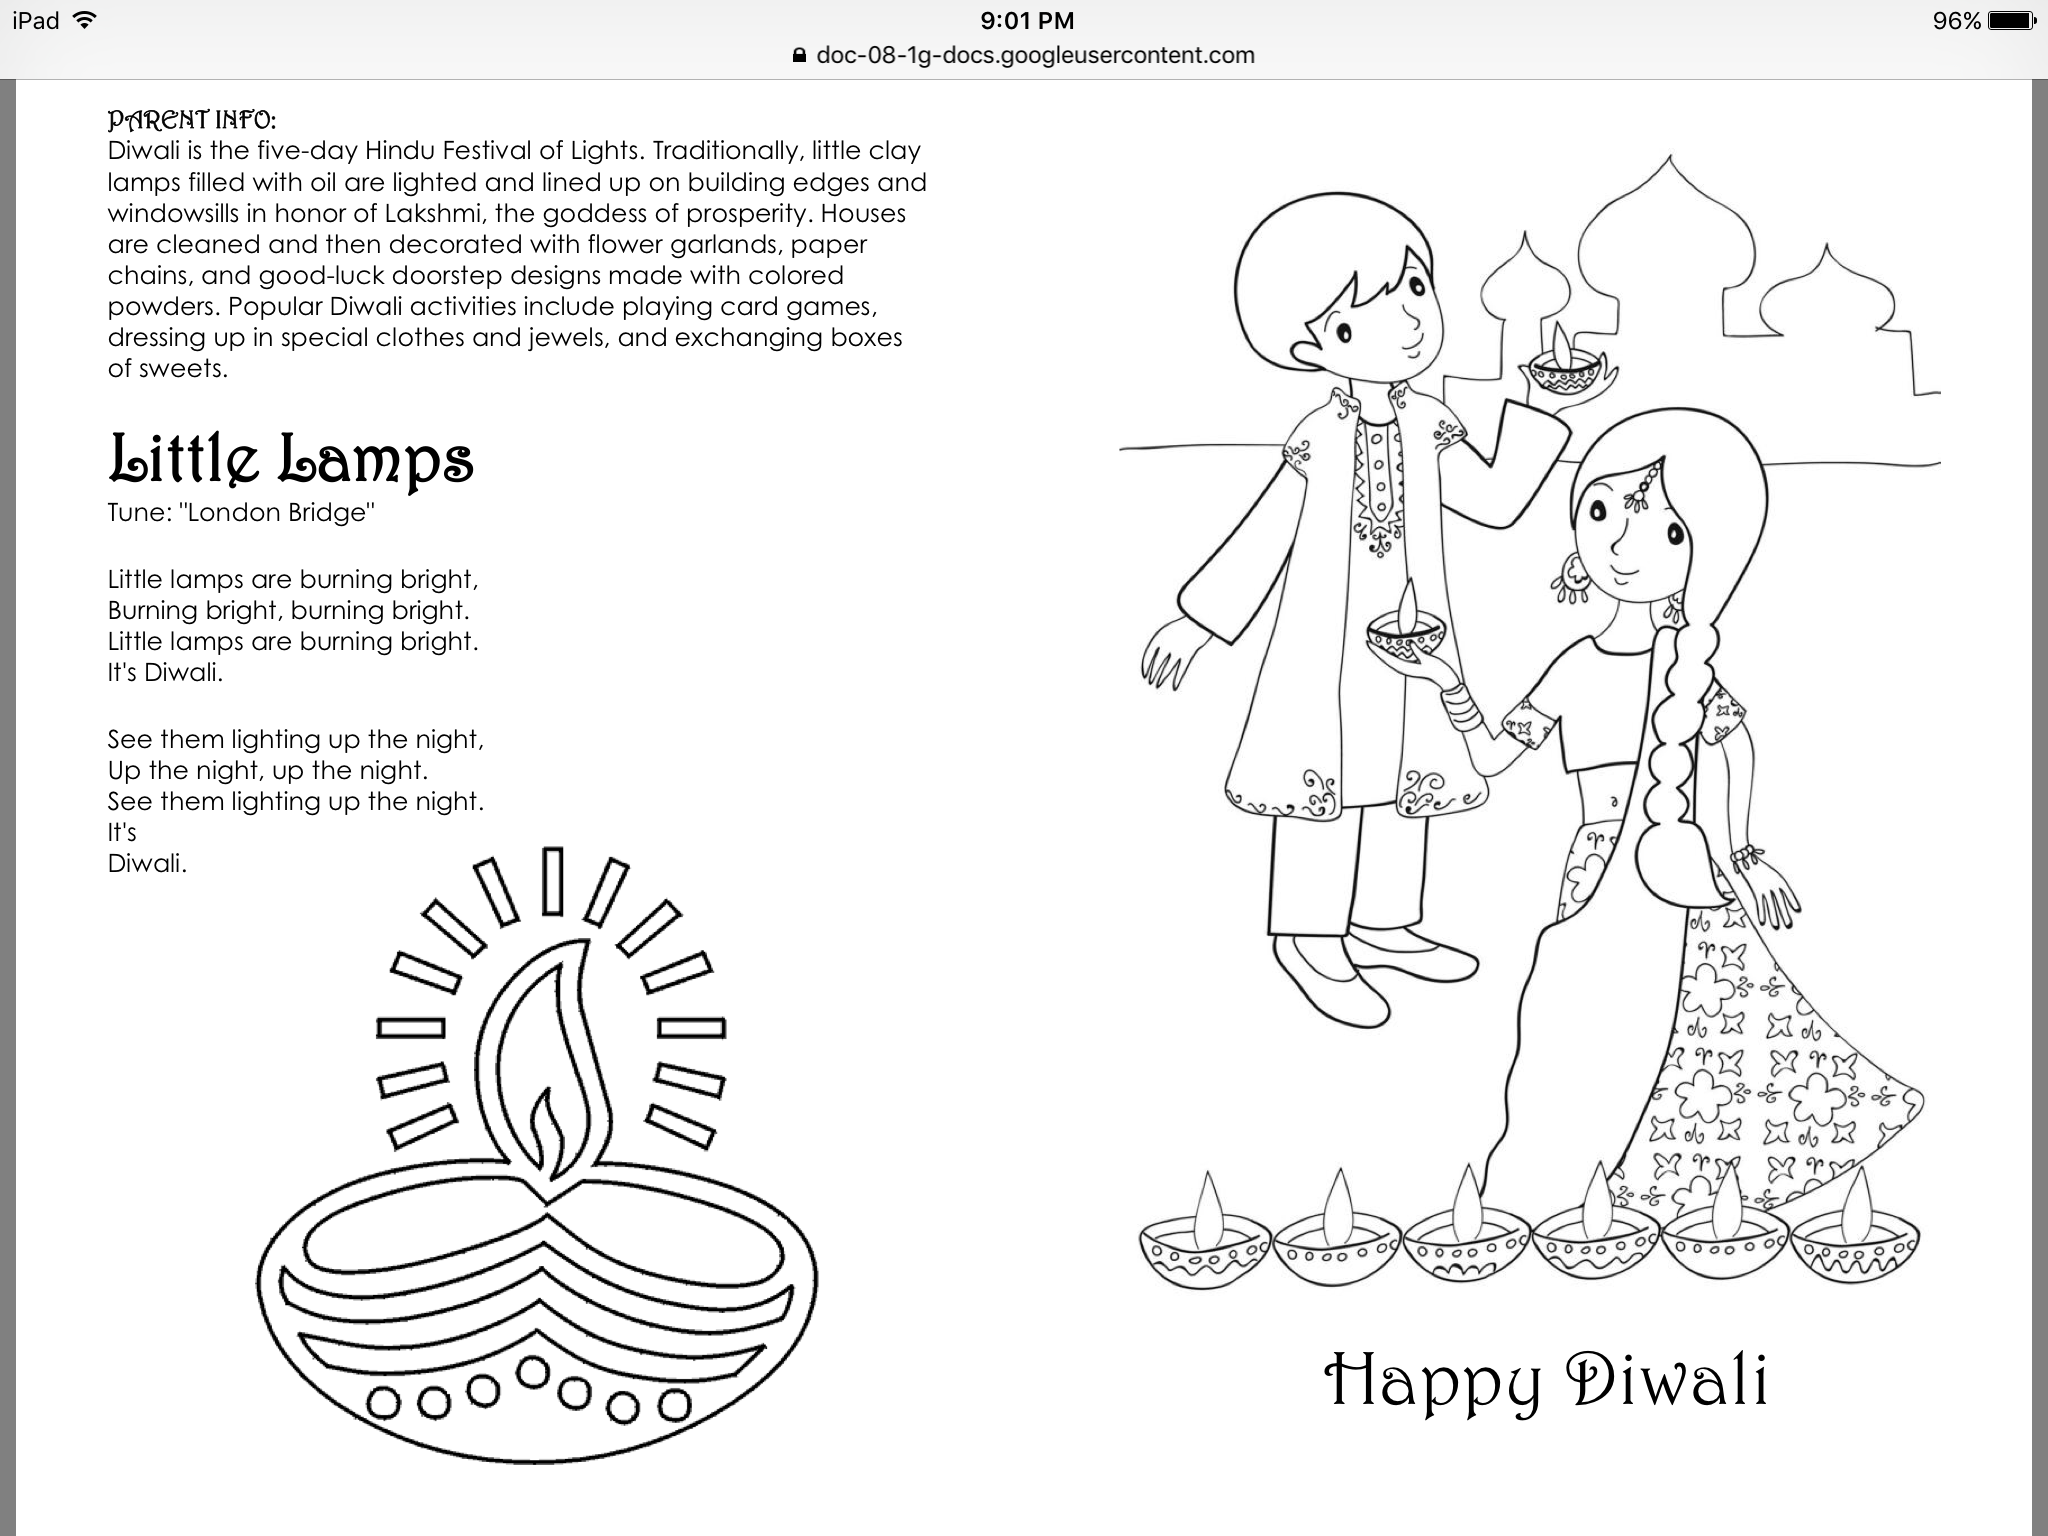 Diwali Info Sheet Diwali For Kids Diwali Diwali Activities [ 1536 x 2048 Pixel ]